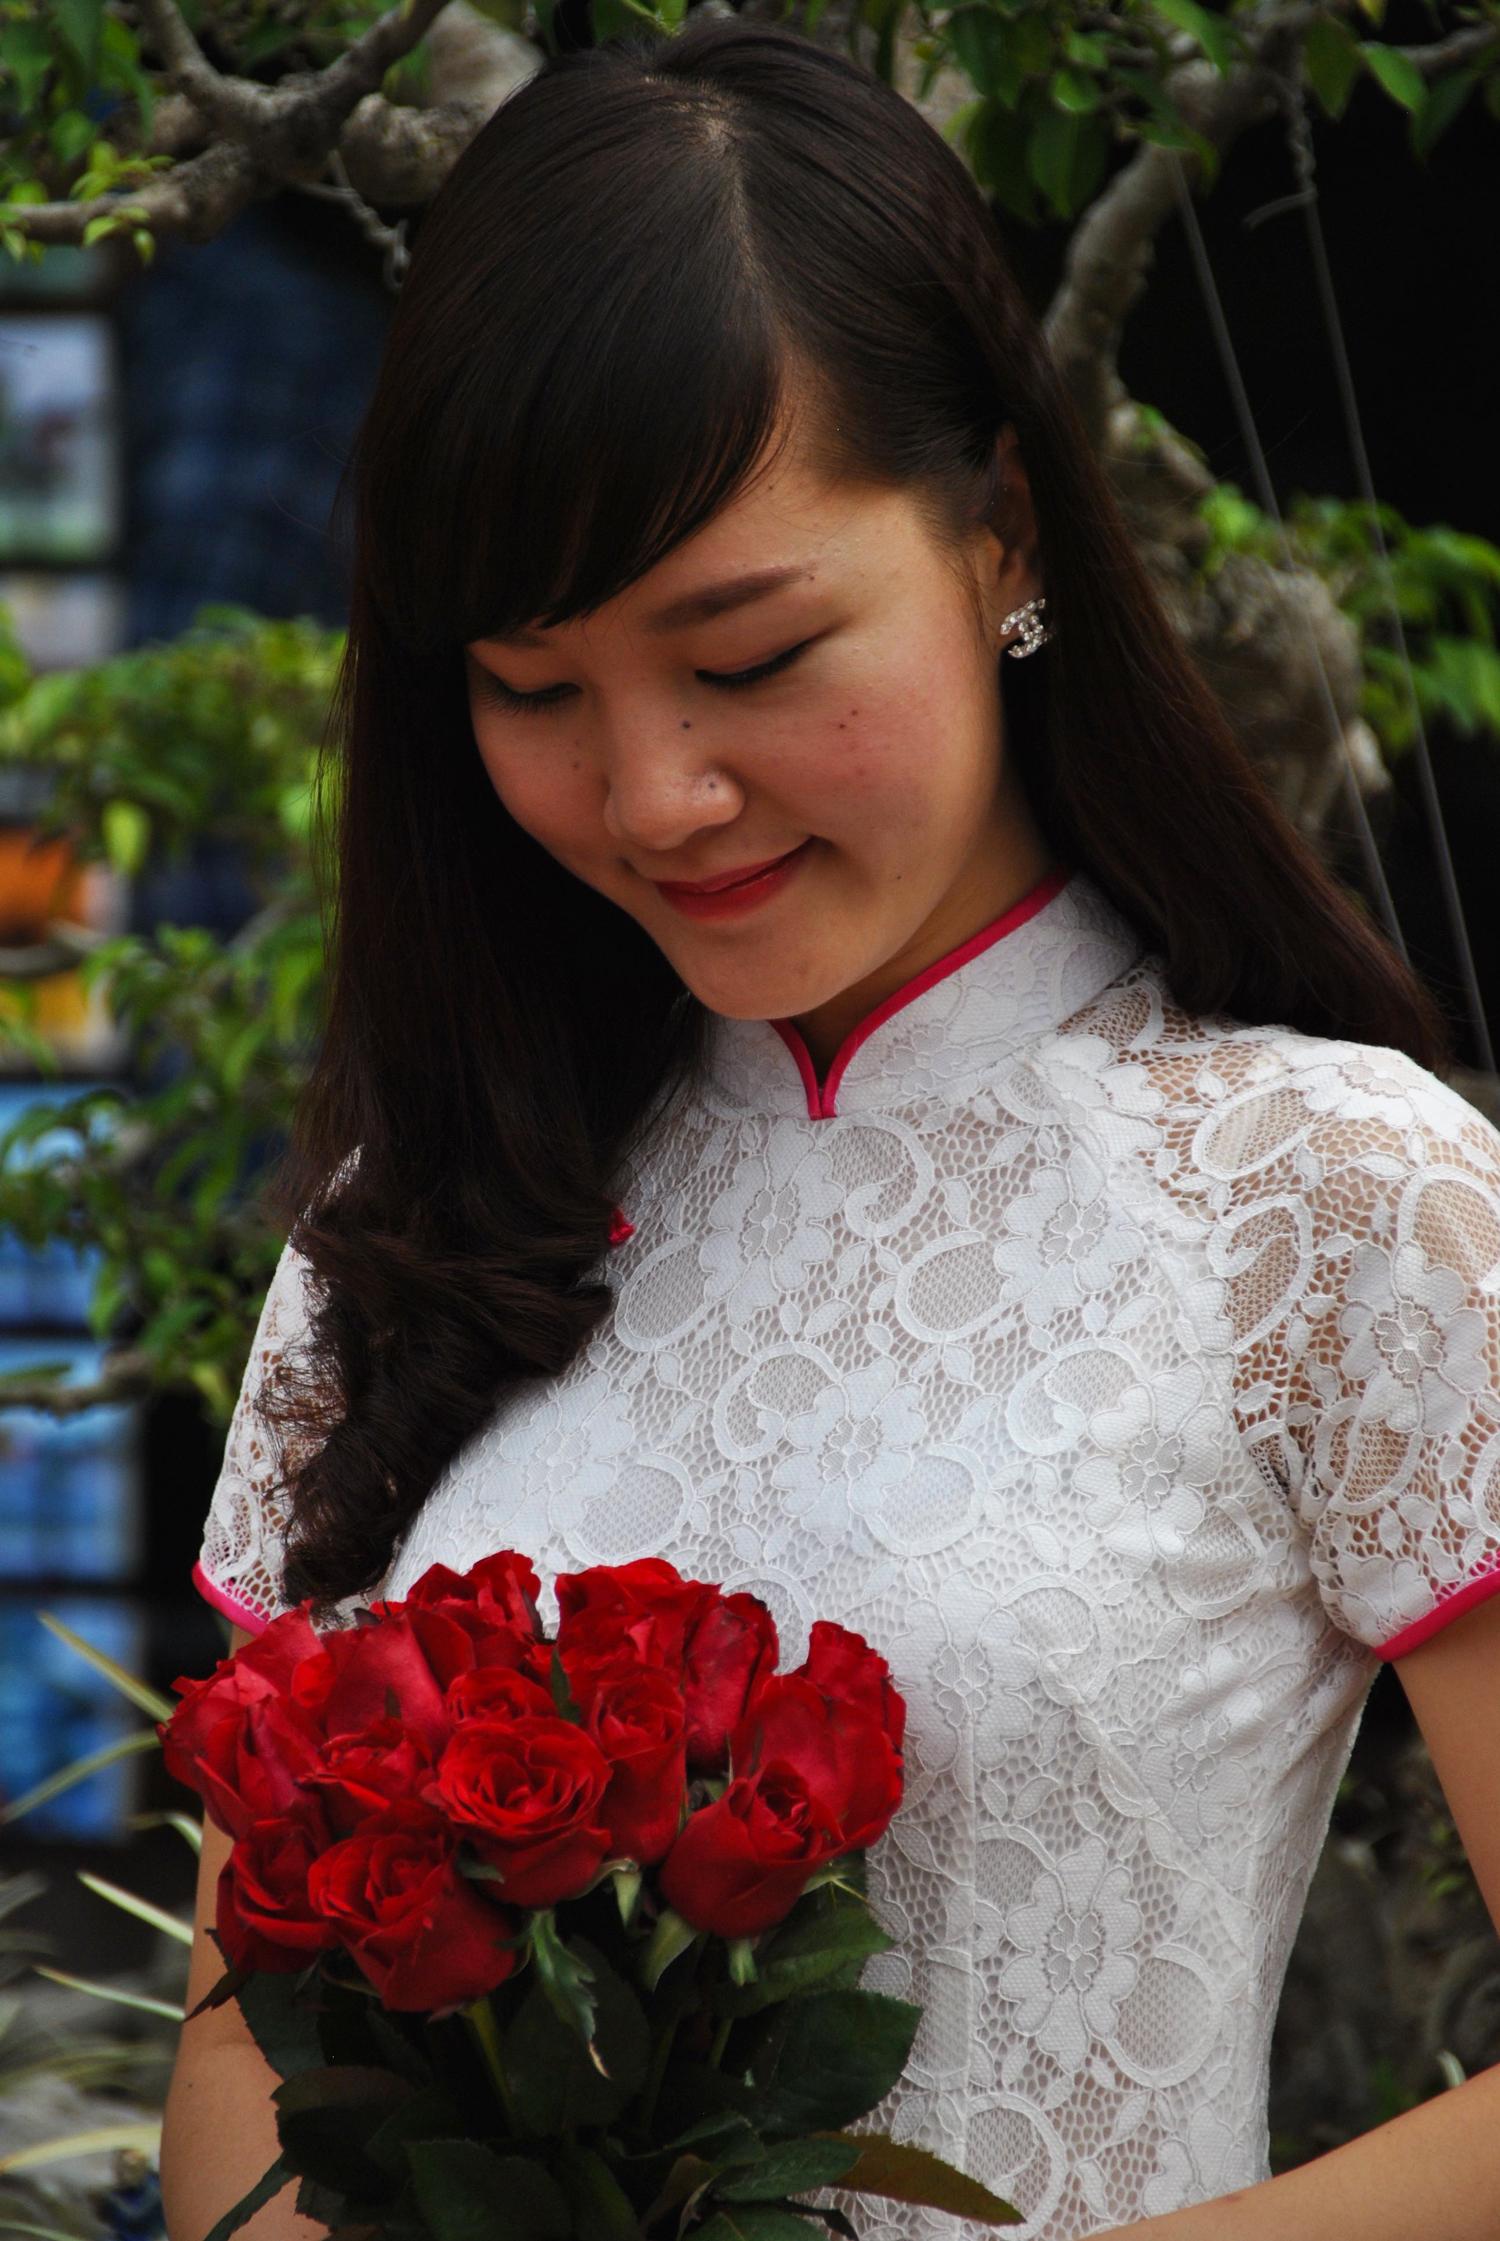 Rose e gioia